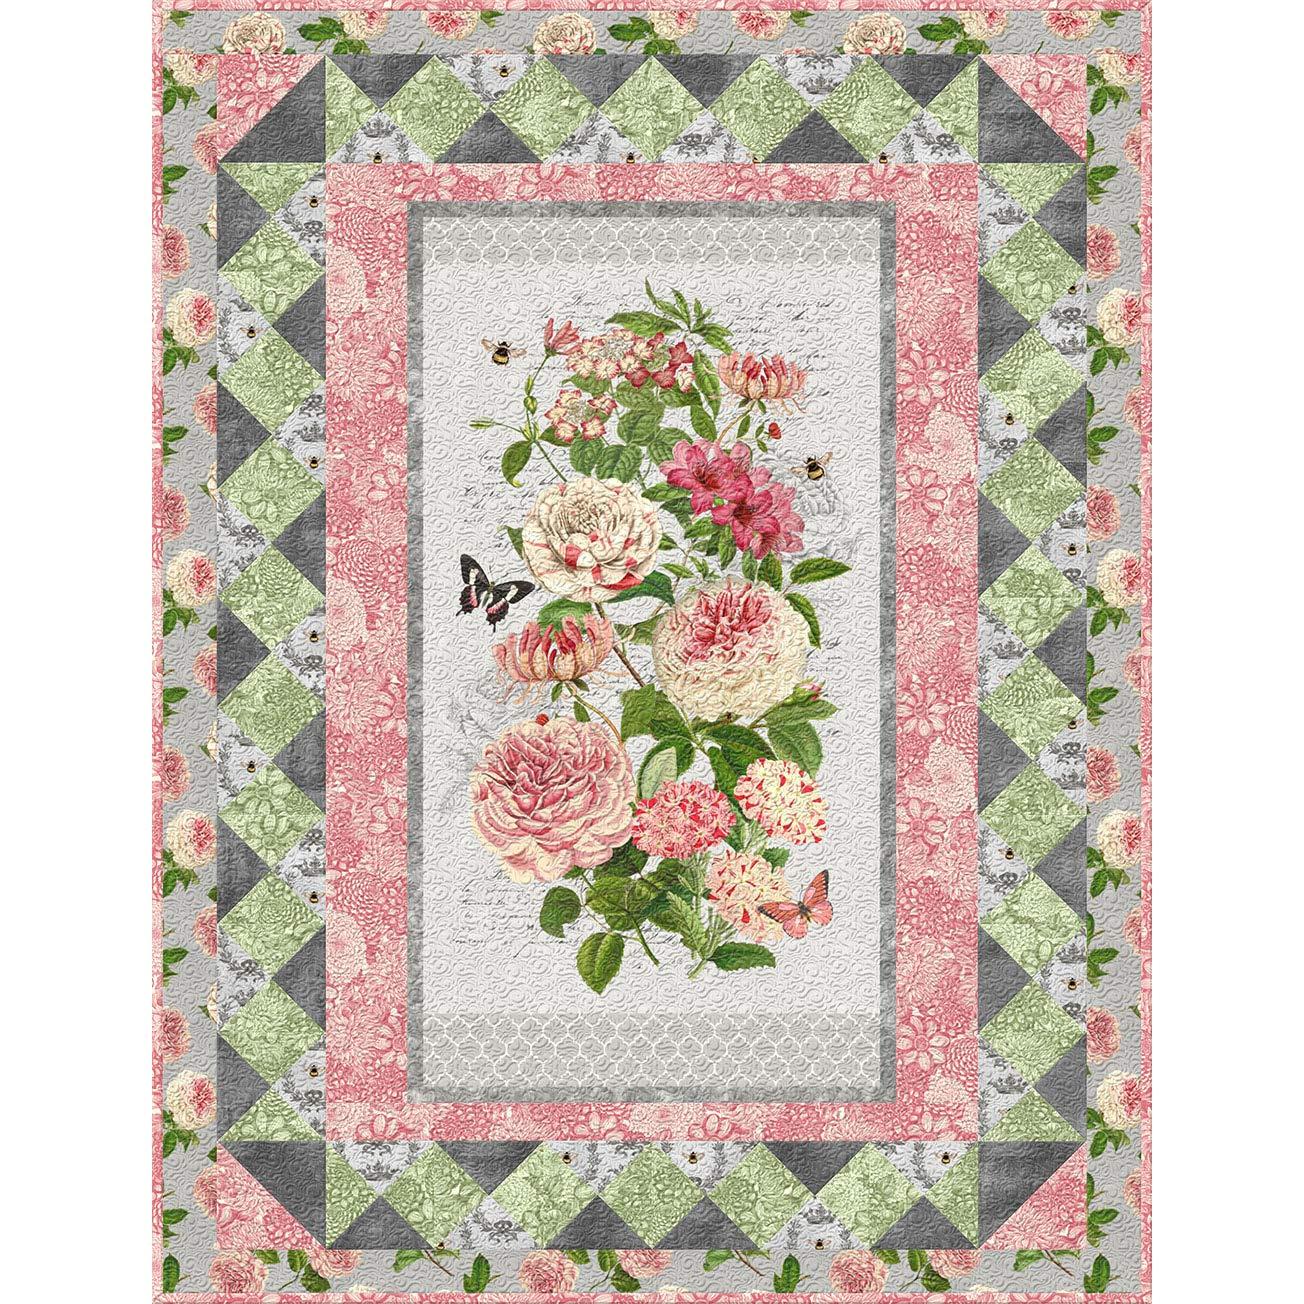 Wilmington Prints Le Bouquet ラティスウォールキルトキット B07RNDM9BS